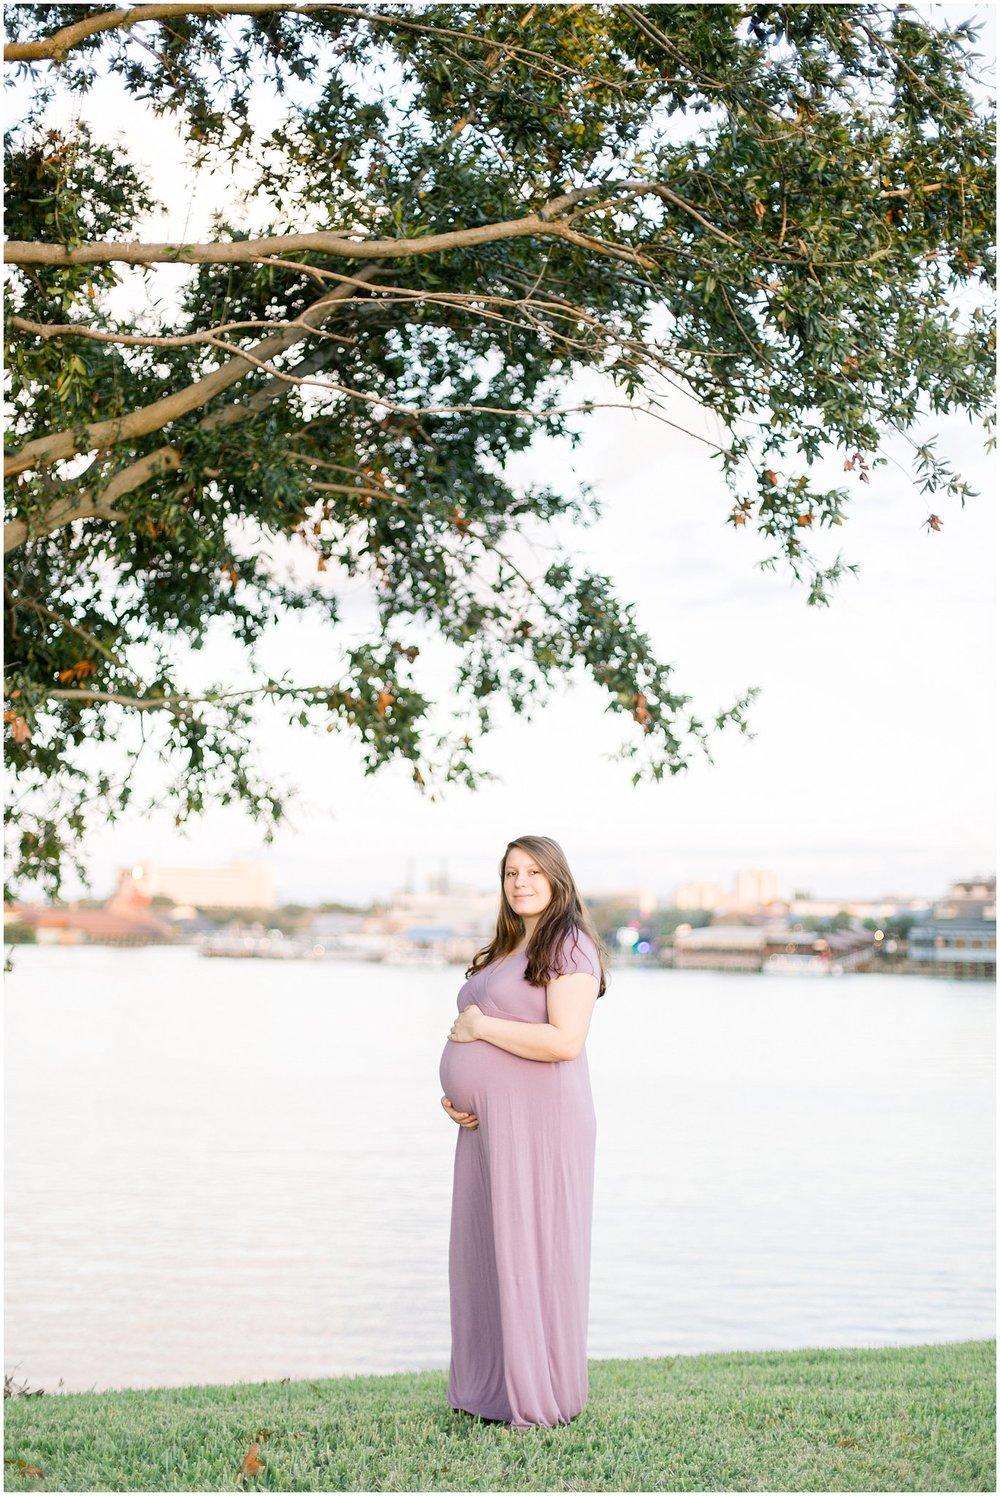 Winter-Garden-Maternity-Newborn-Photographer_0015.jpg